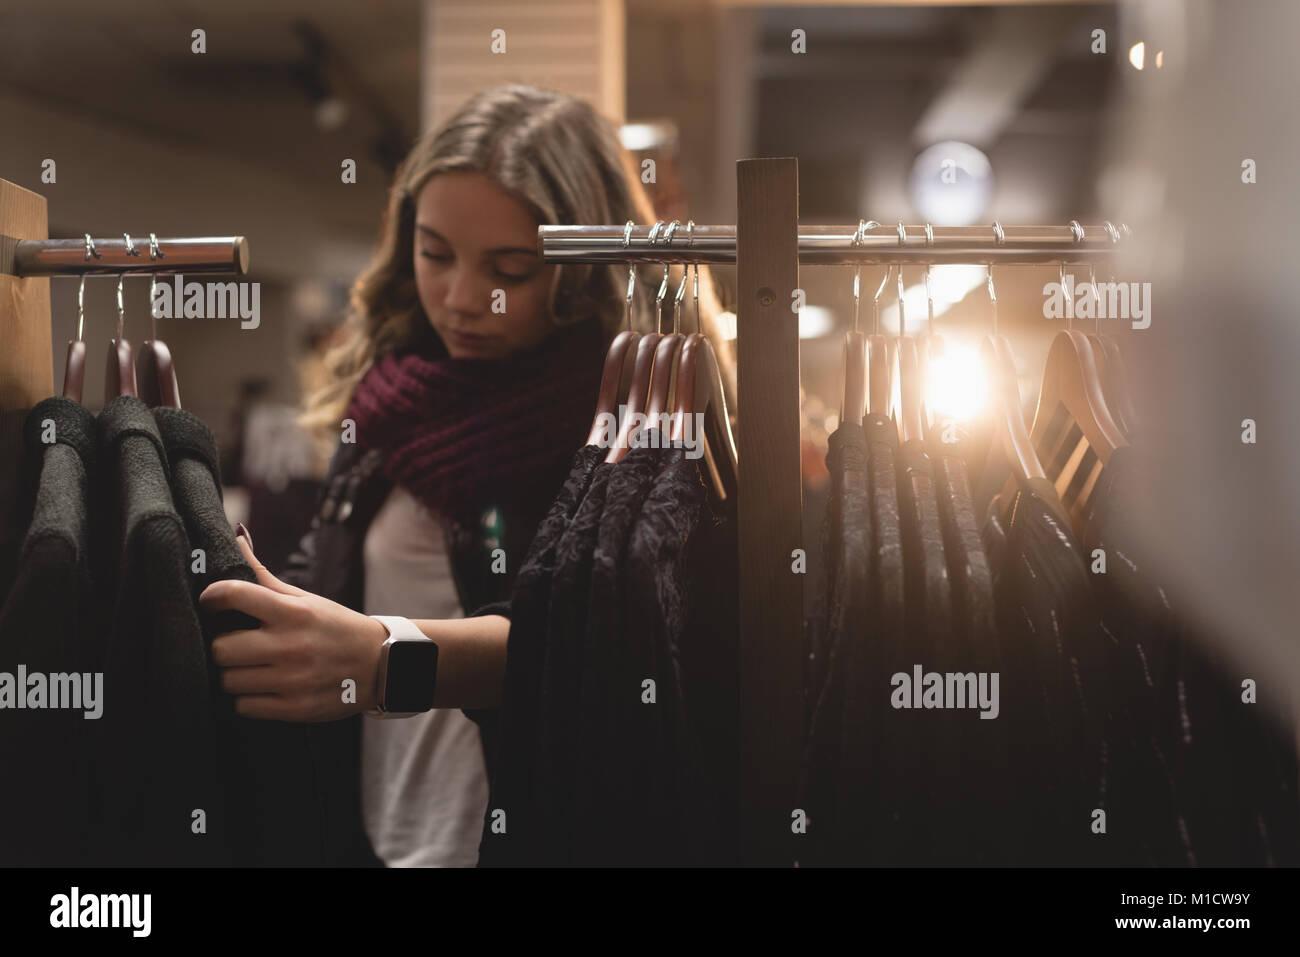 Beautiful woman selecting dress from rack - Stock Image